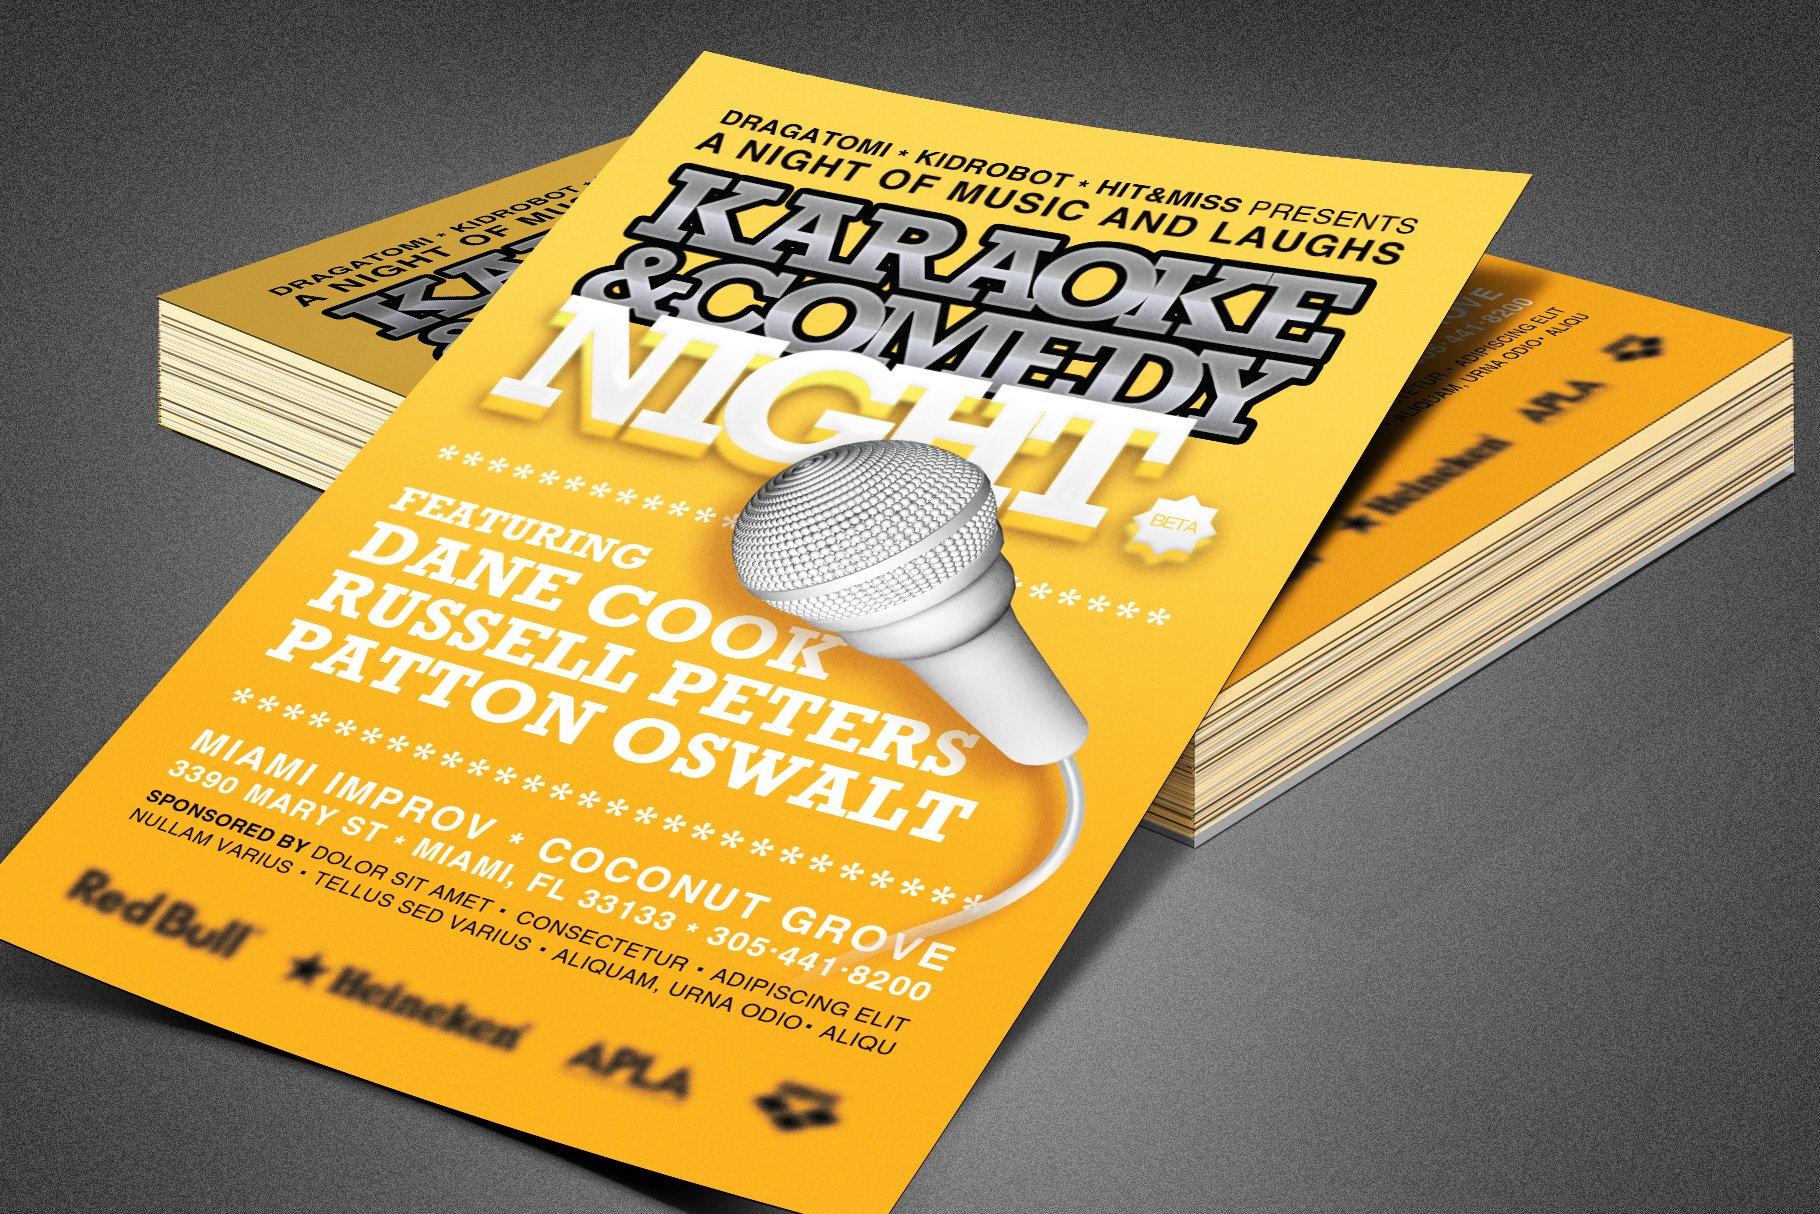 karaoke and comedy night flyer flyer templates. Black Bedroom Furniture Sets. Home Design Ideas